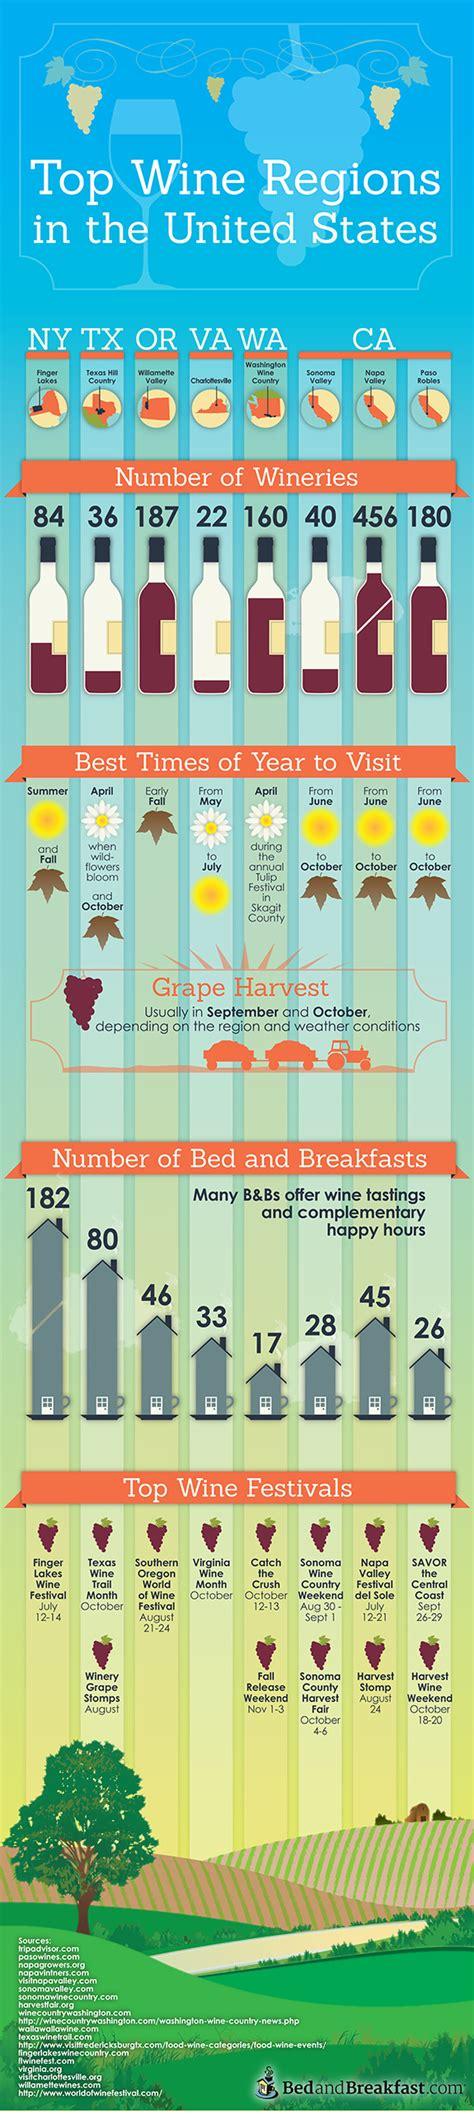 best wine regions top wine regions in the us bedandbreakfast bed and